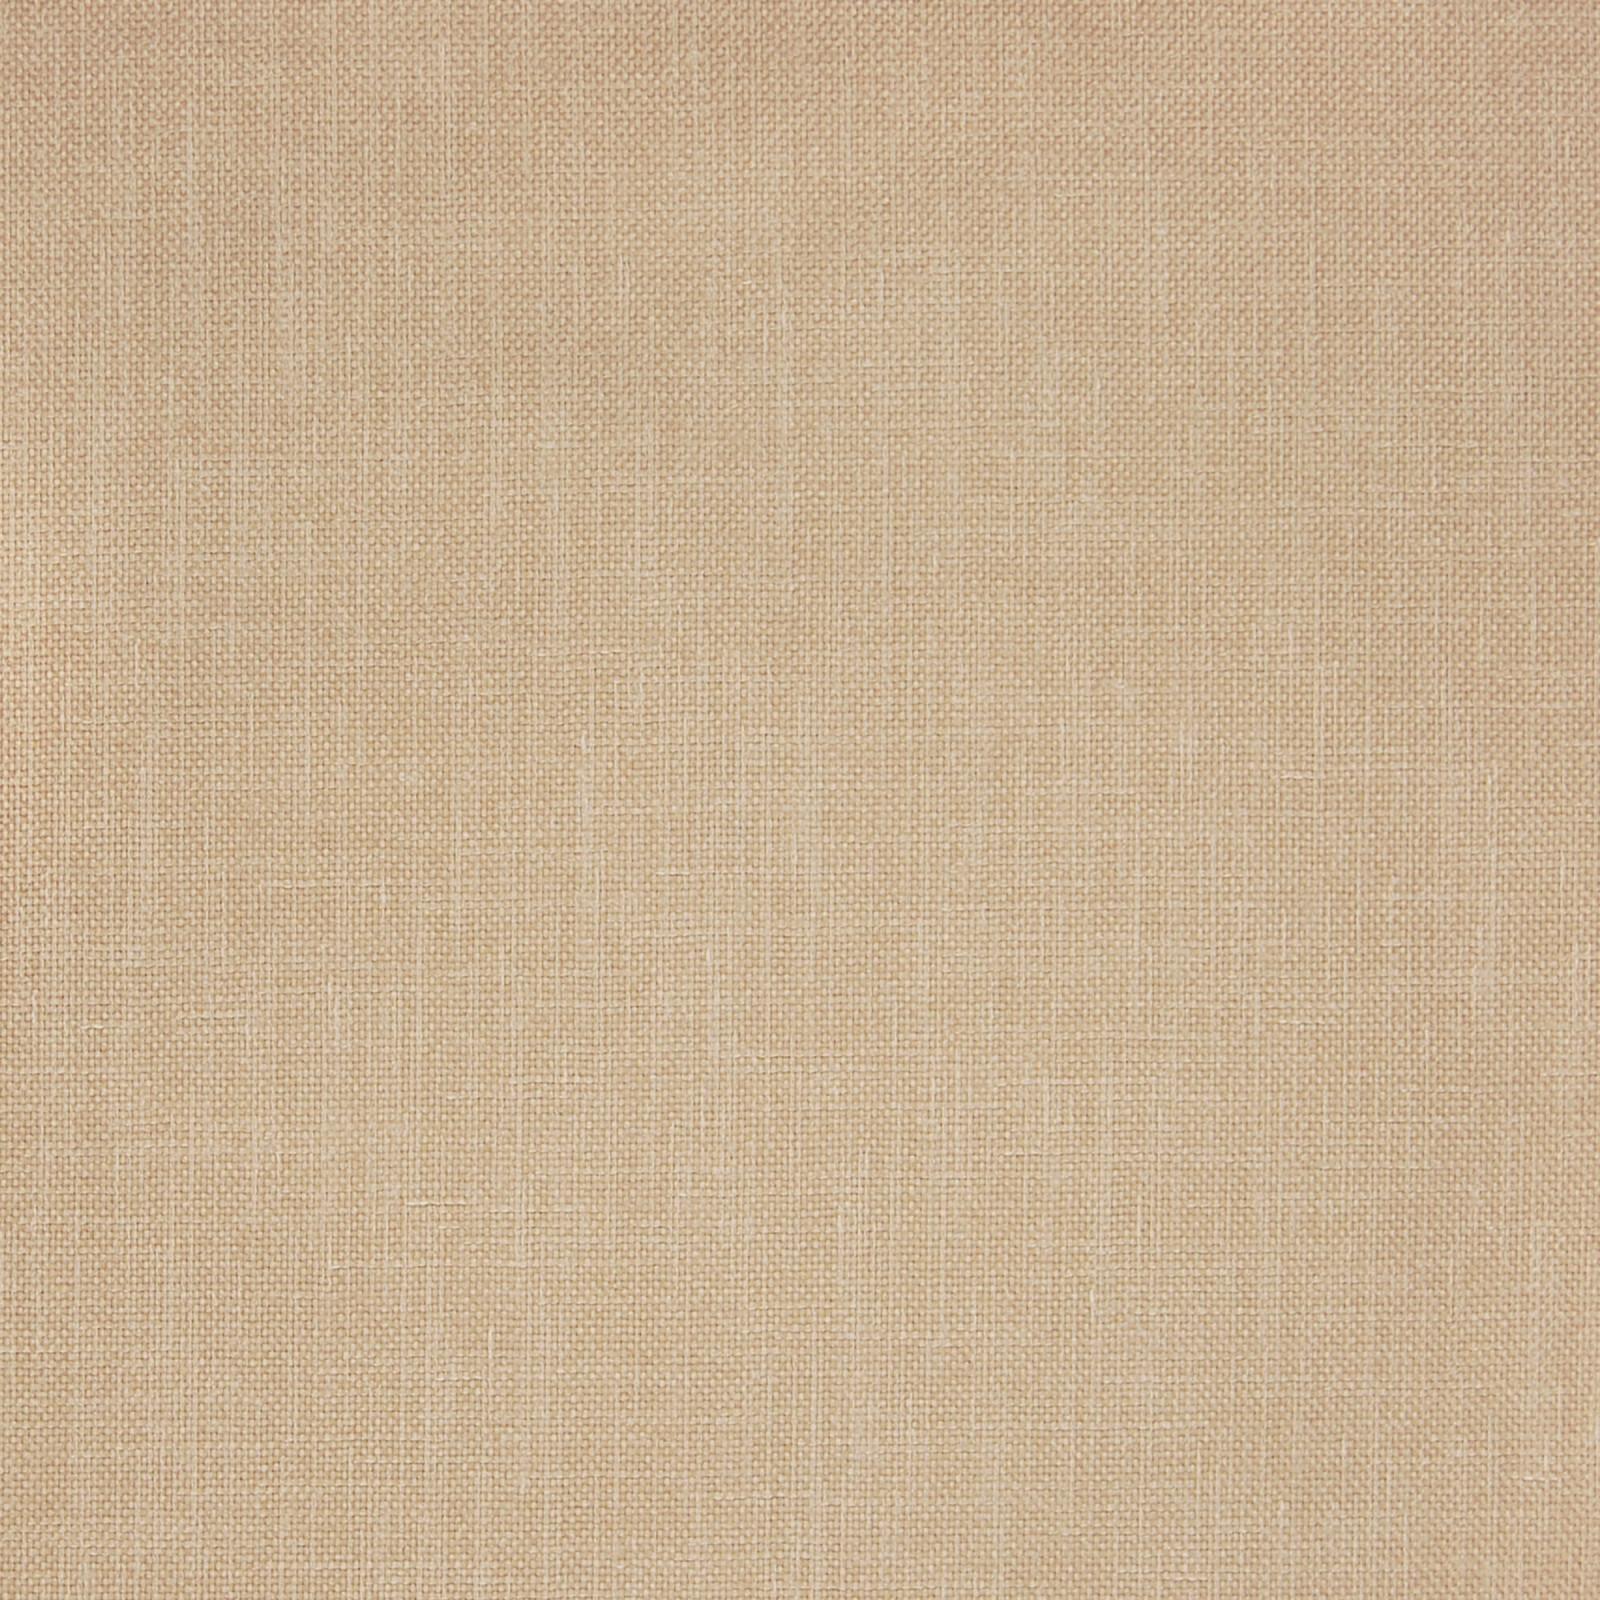 A9564 Chino  Greenhouse Fabrics